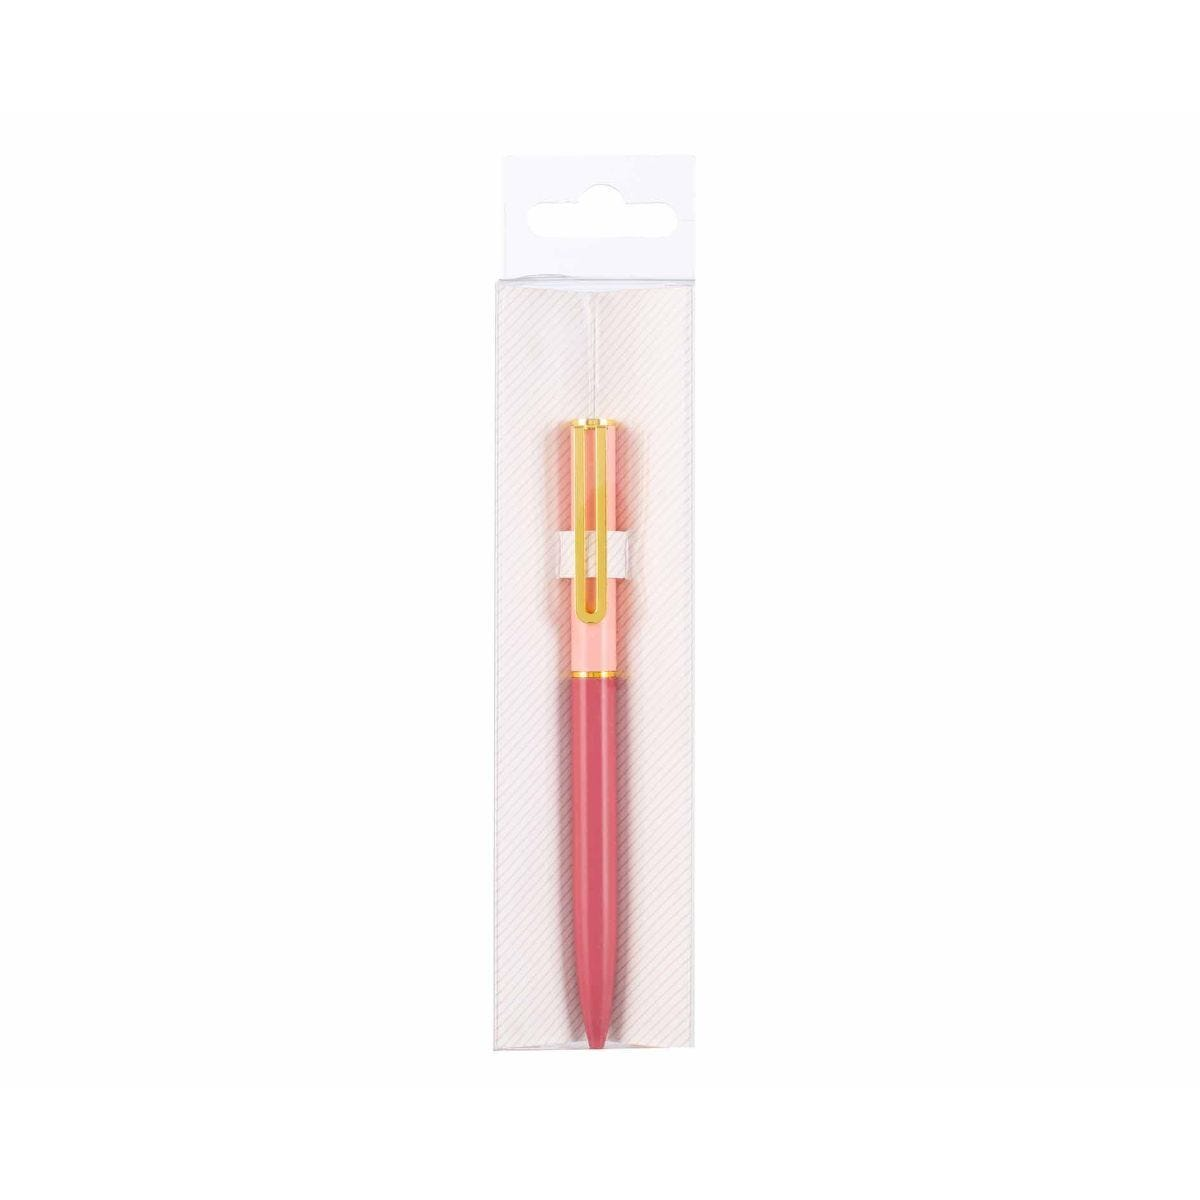 Ryman Metal Ballpoint Pen with Gold Clip Light Pink